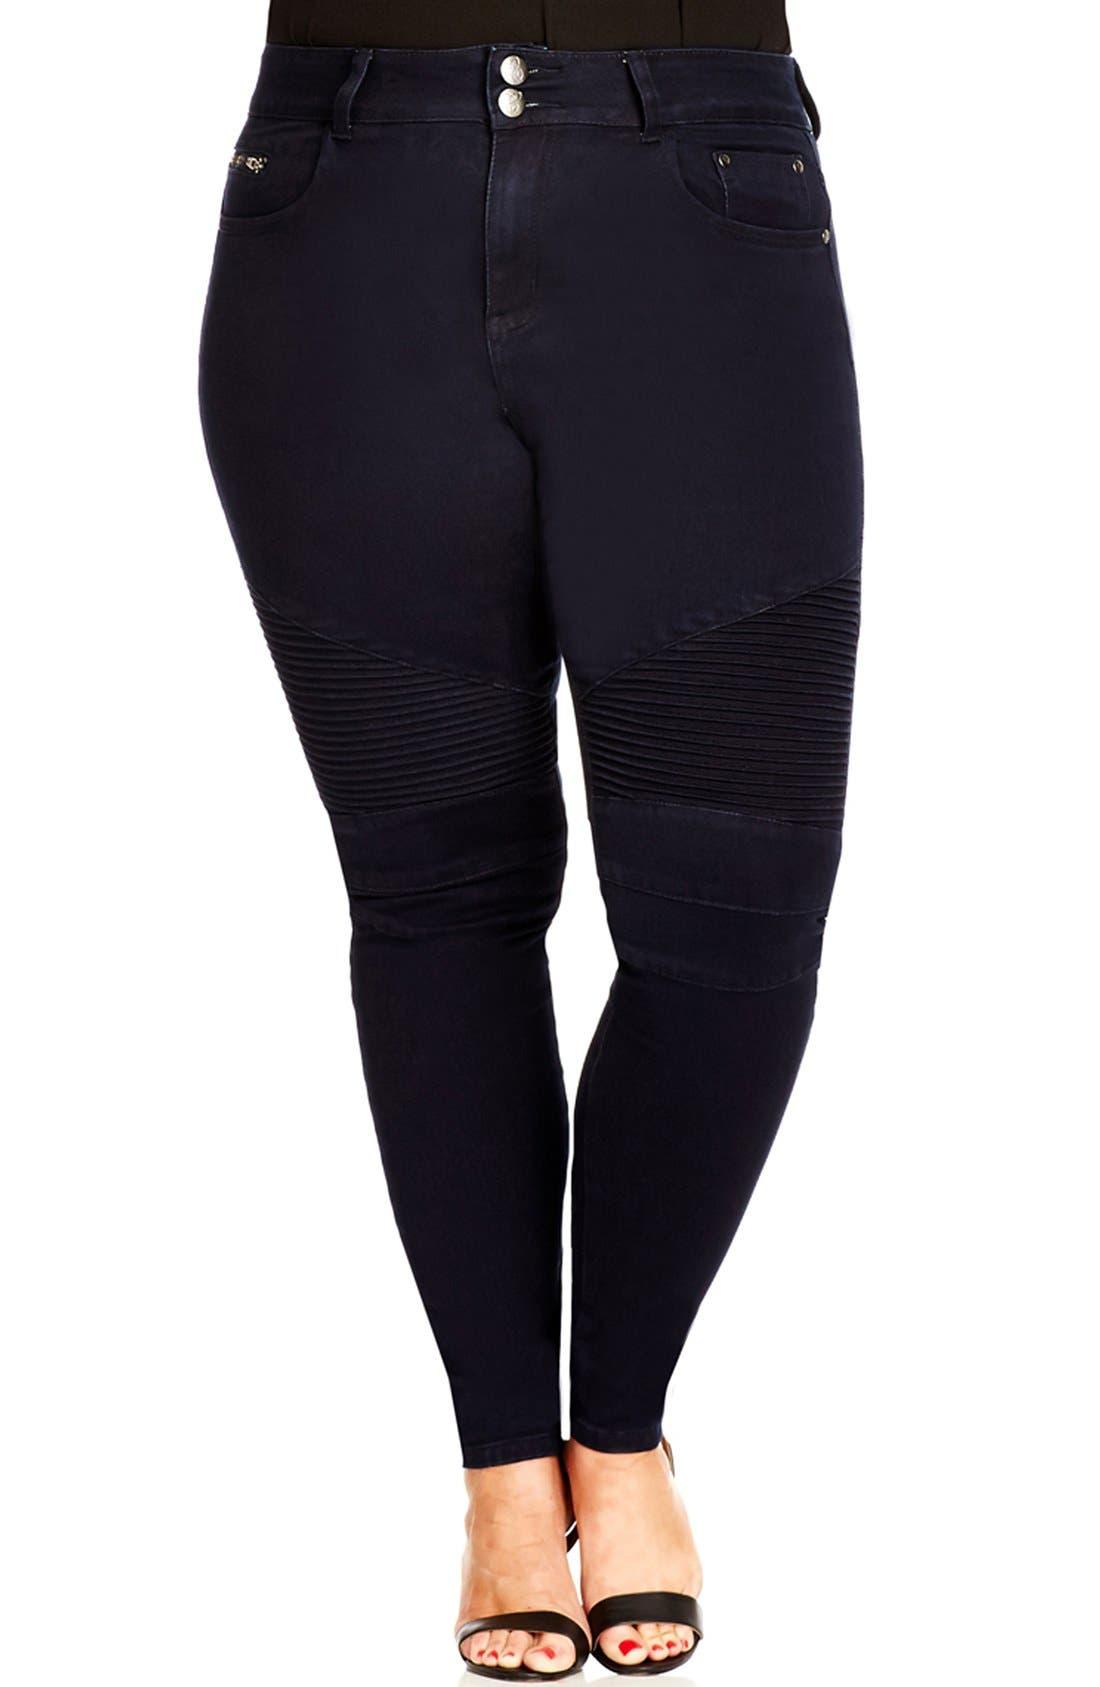 Main Image - City Chic 'Moto' Stretch Skinny Jeans (Dark Denim) (Plus Size)